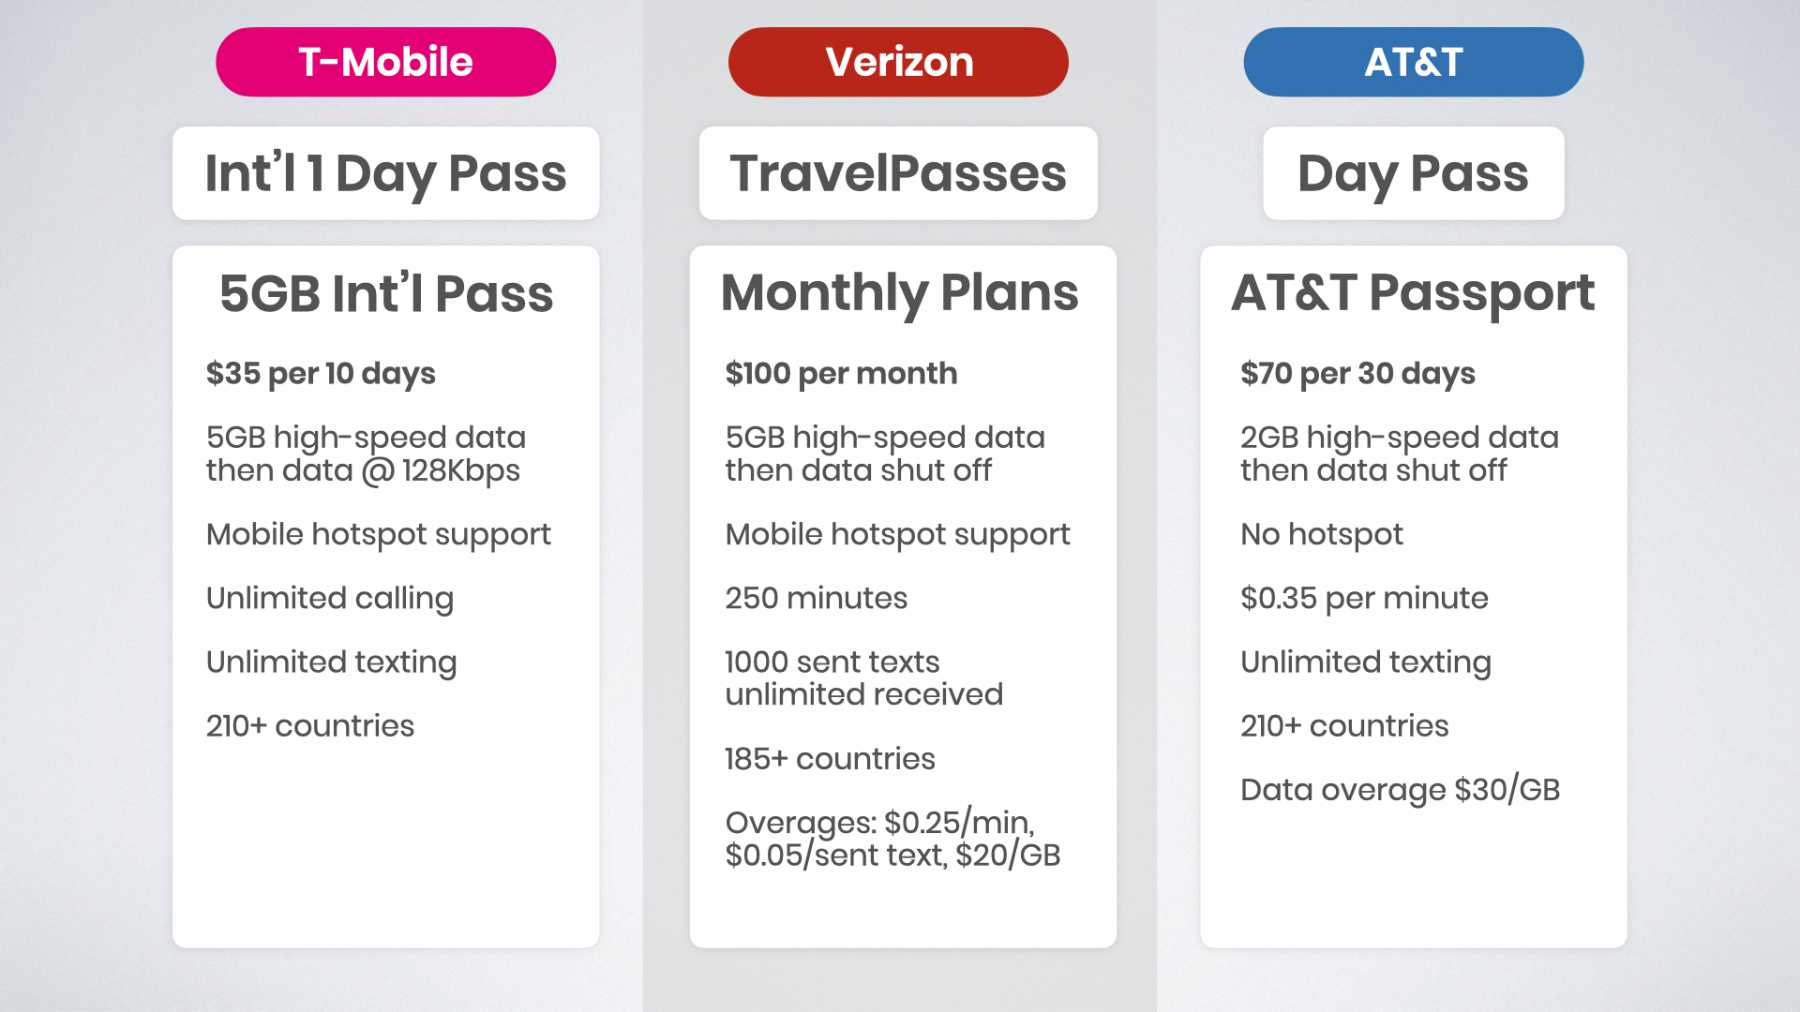 T-Mobile vs Verizon vs AT&T monthly international plan comparison